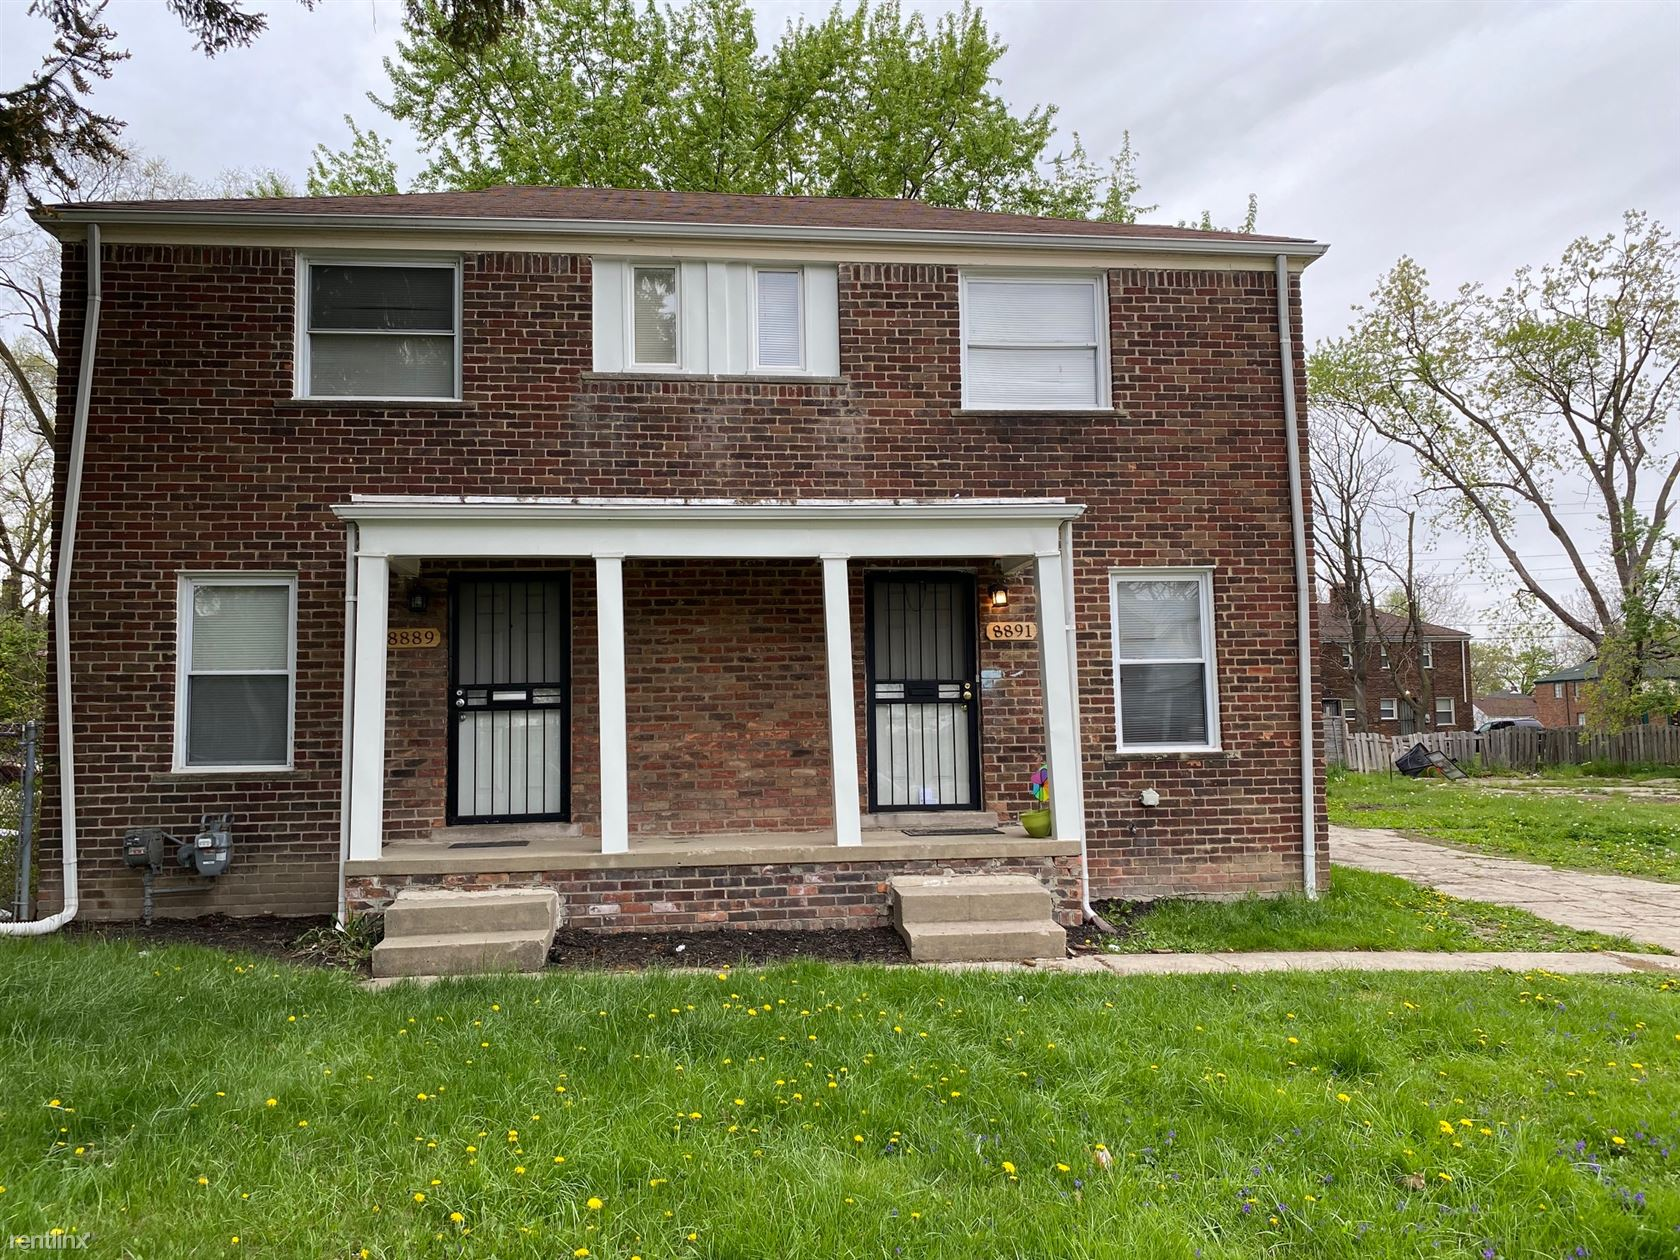 8891 Prevost St, Detroit, MI - $850 USD/ month